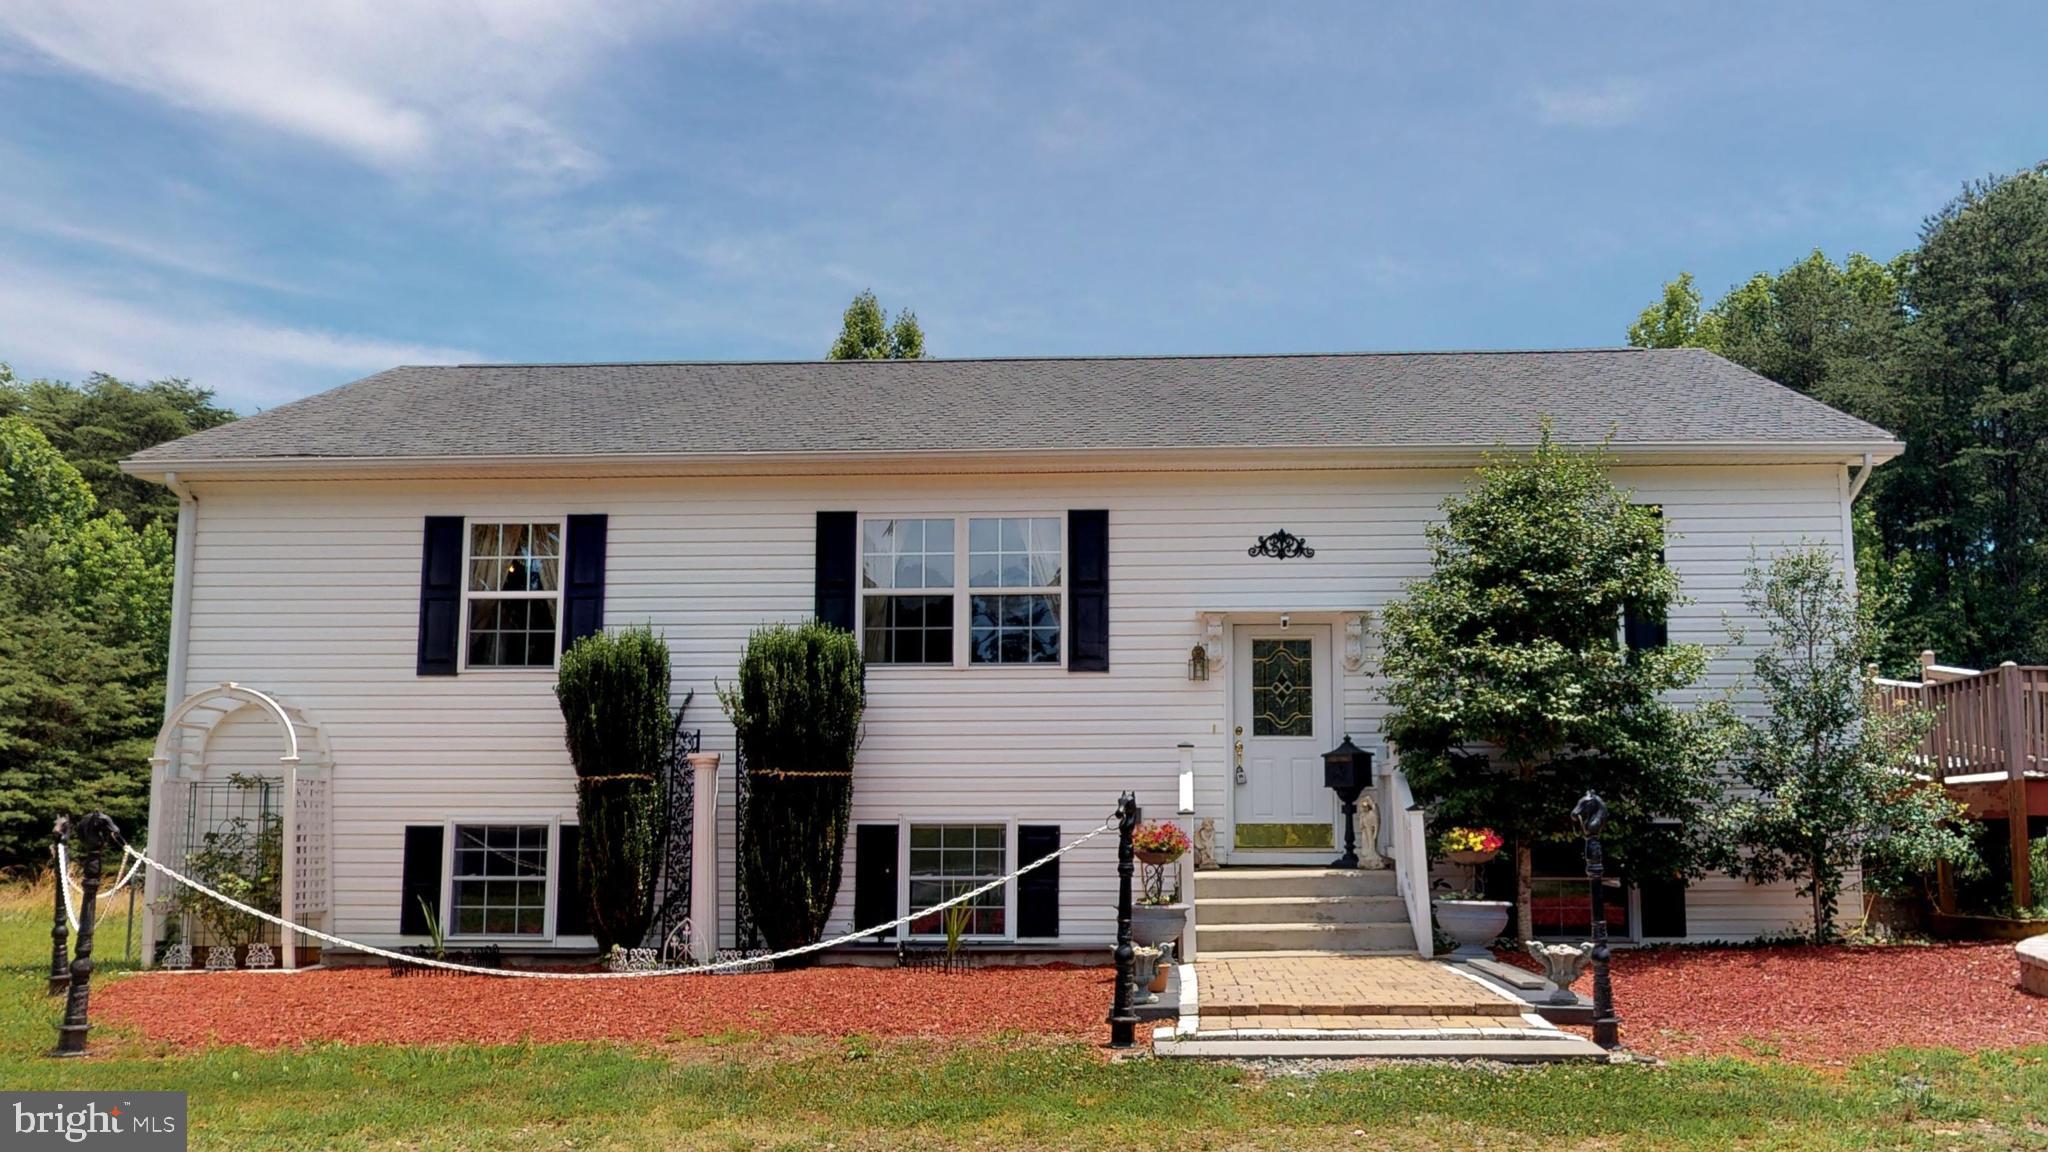 162 COMMUNITY HOUSE ROAD, KENTS STORE, VA 23084